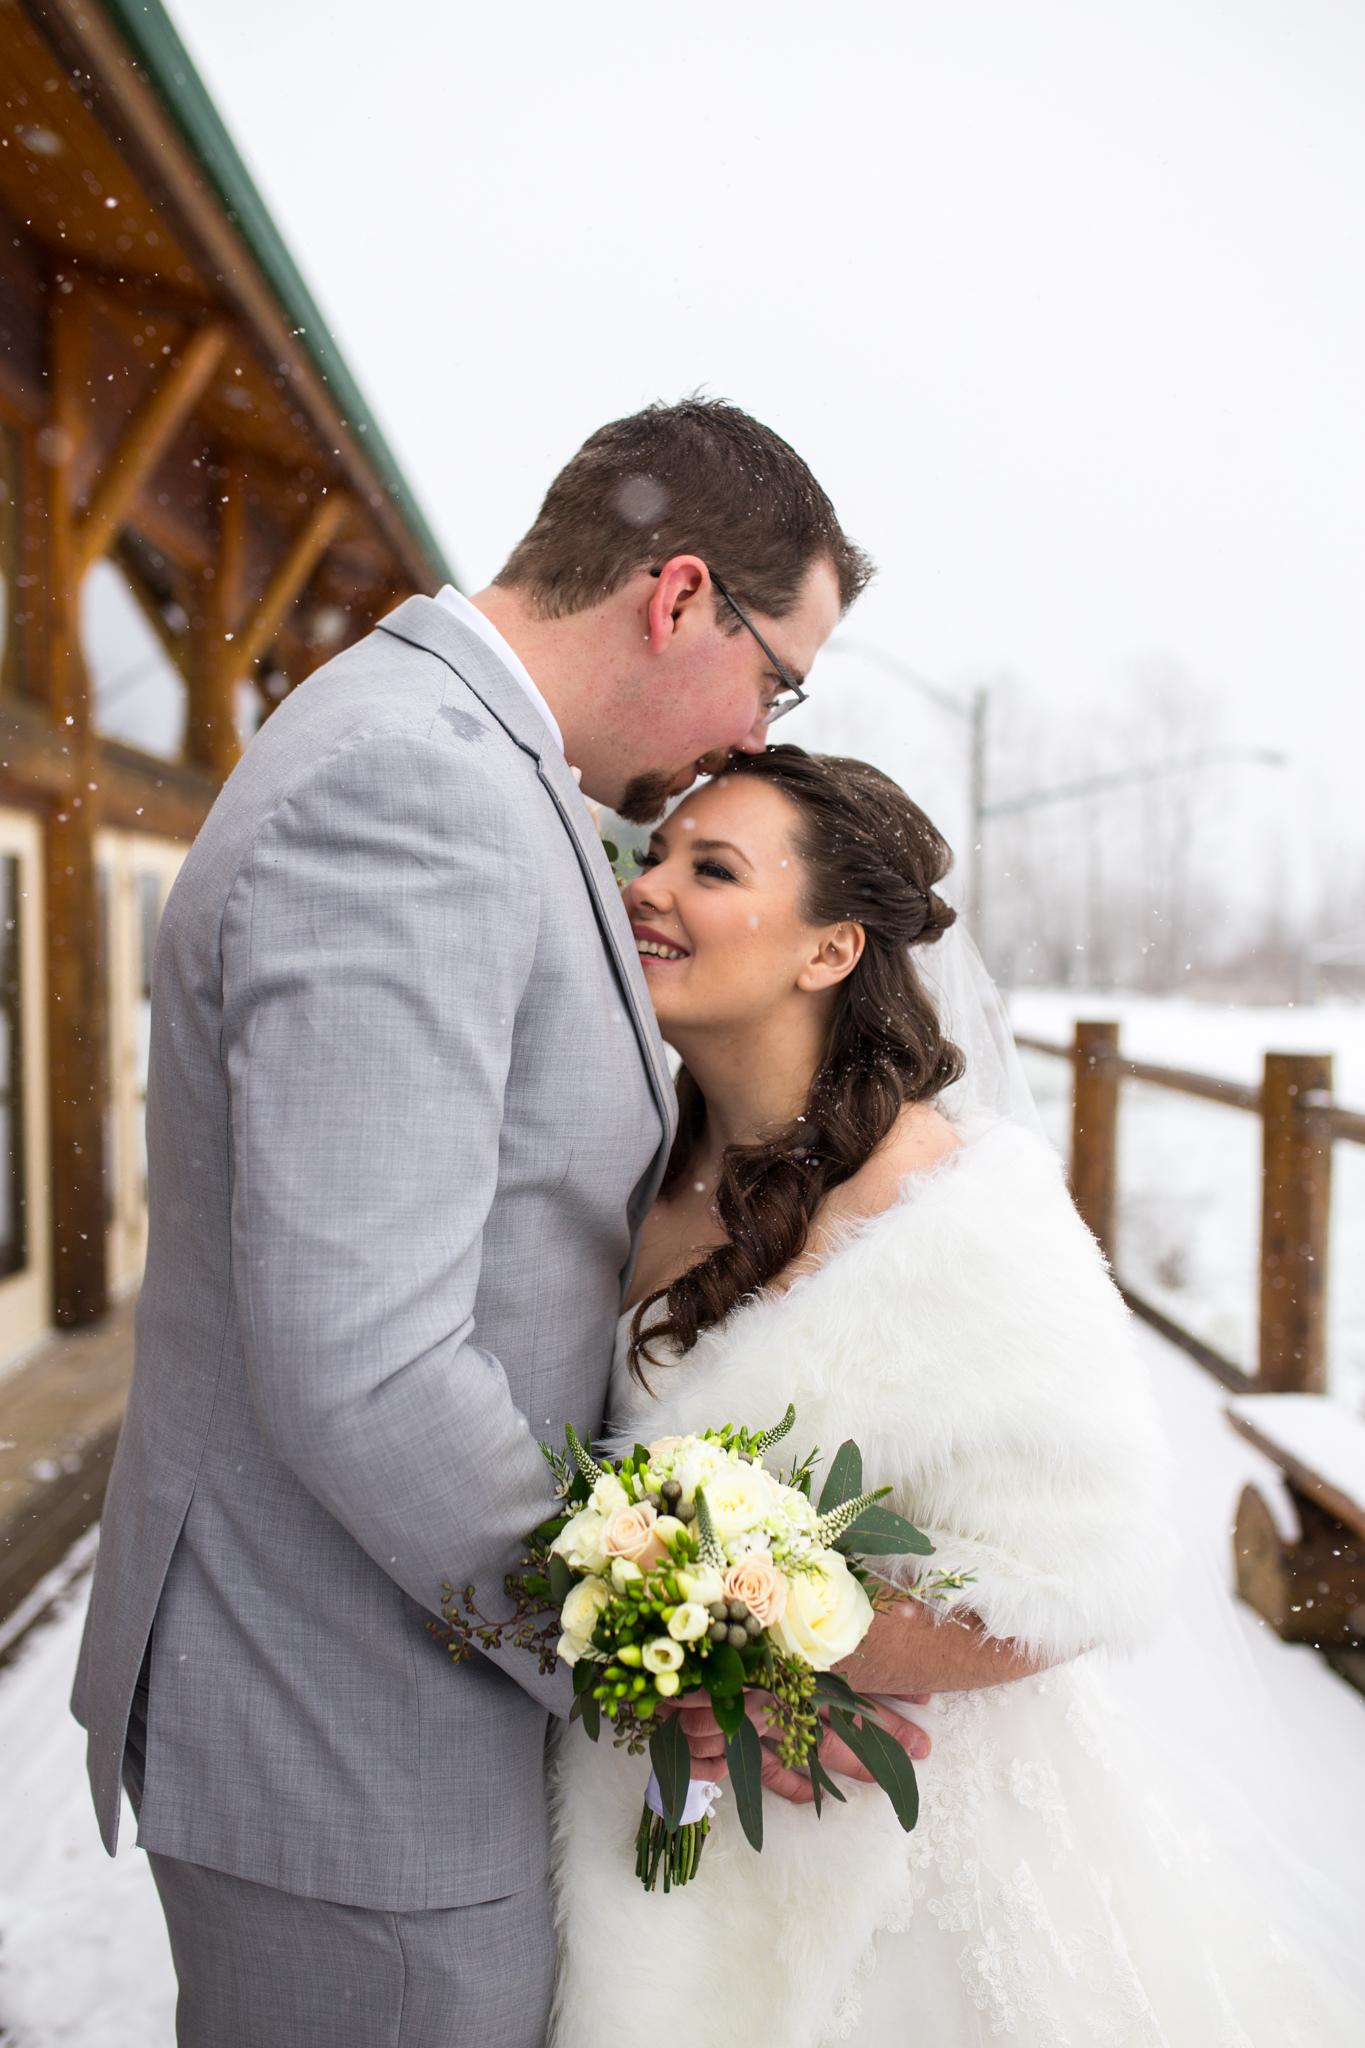 Fraser River Lodge Wedding 28.JPG